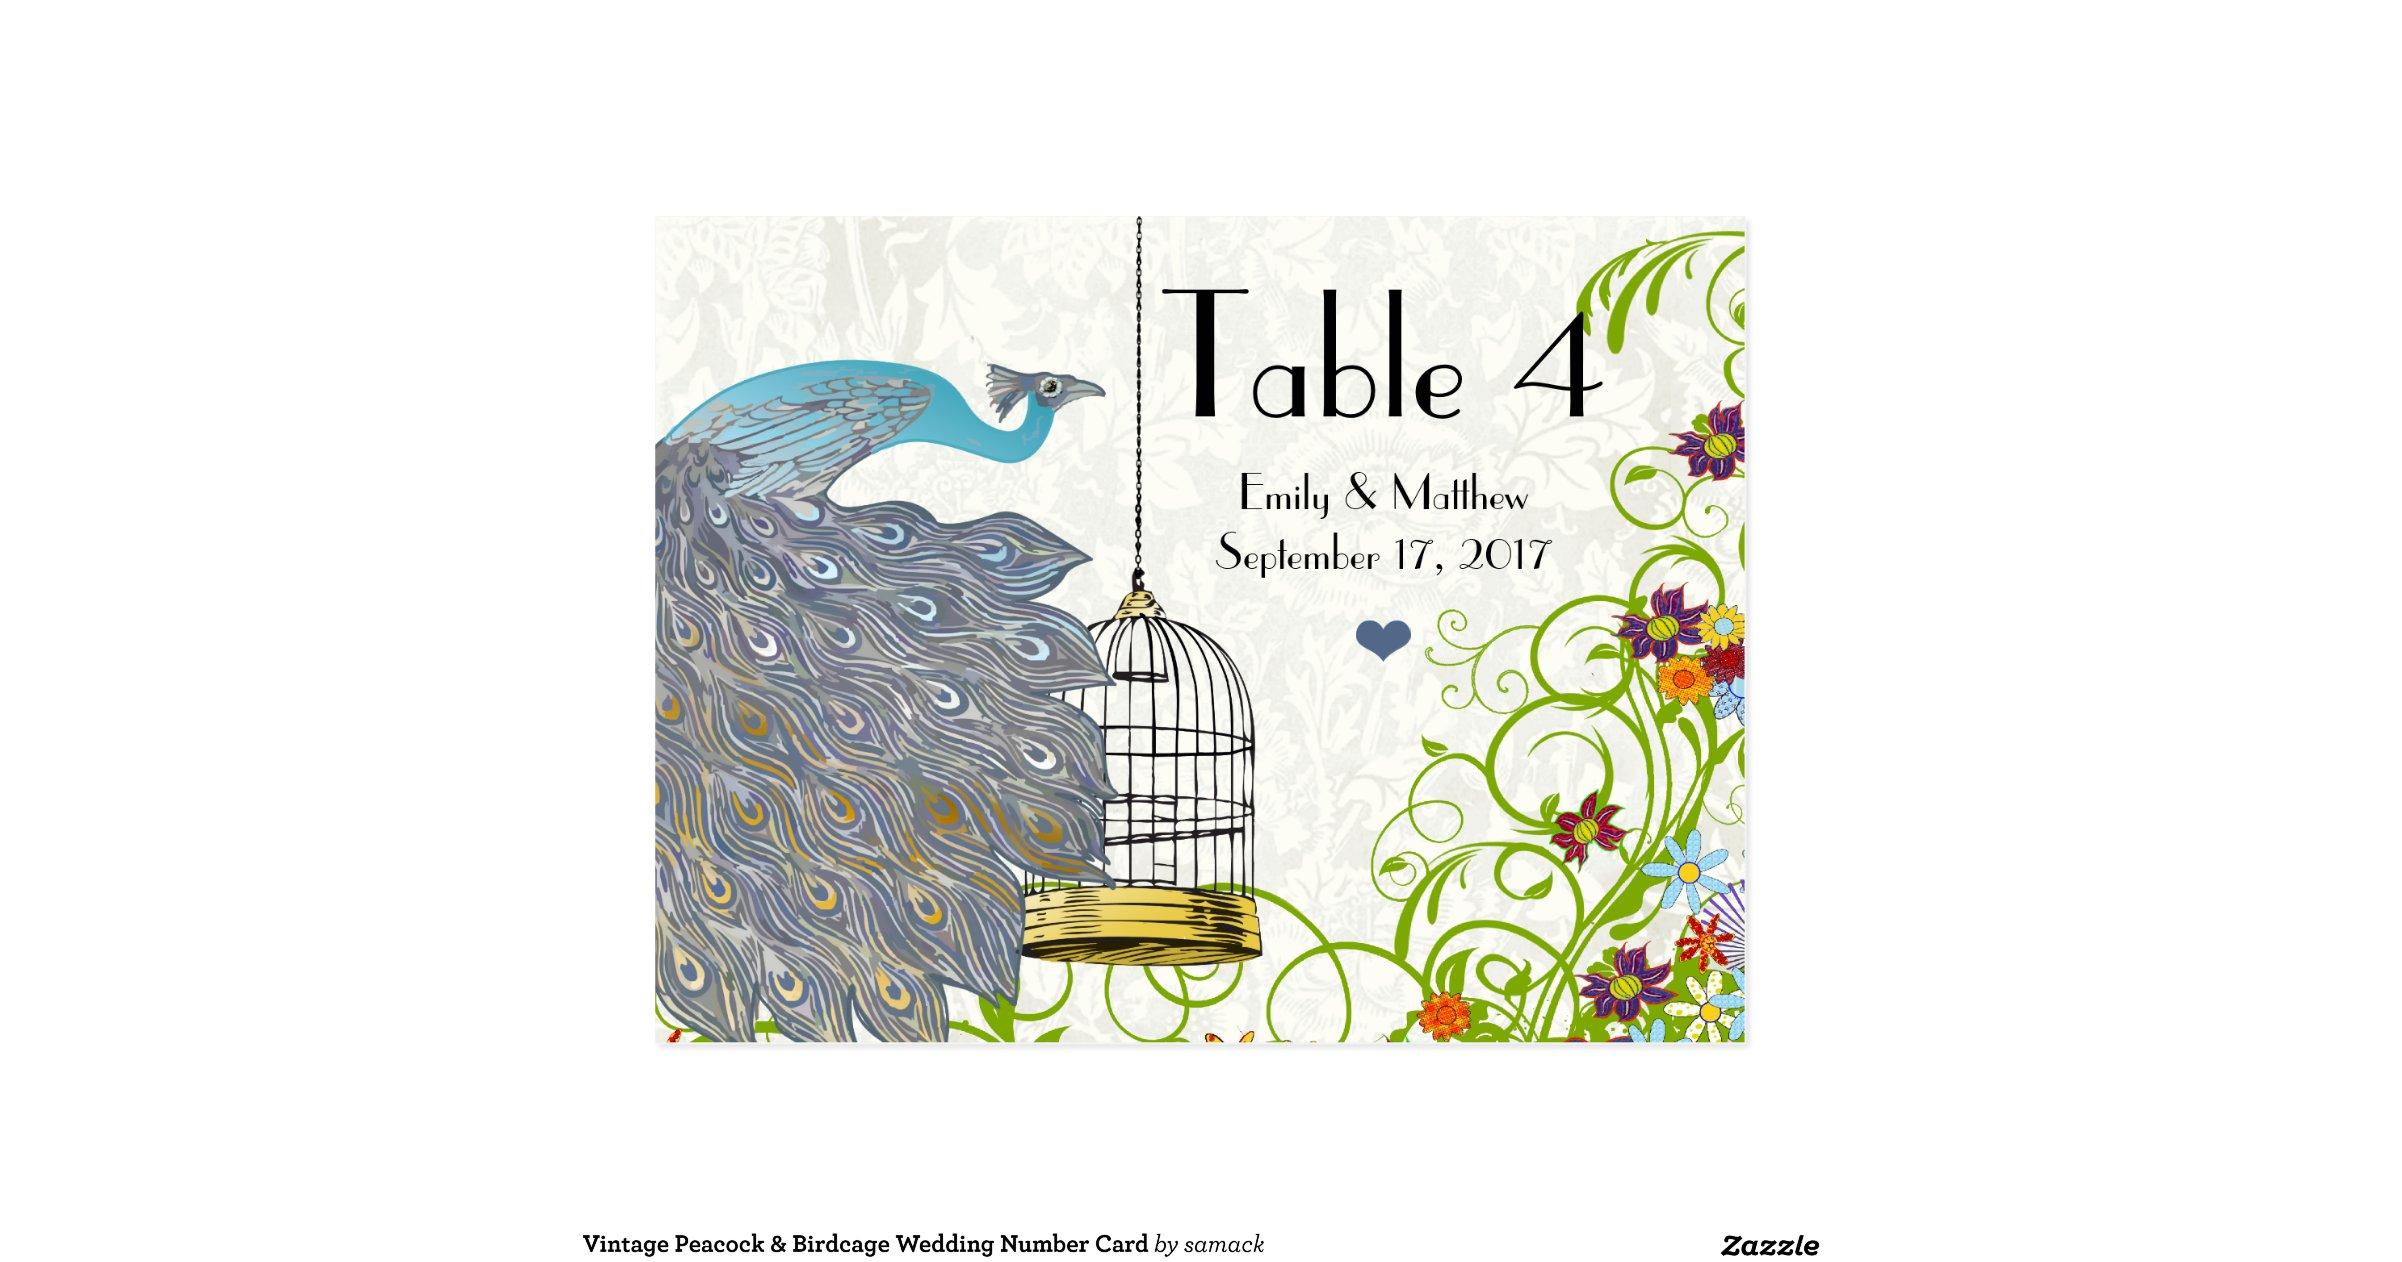 Vintage Peacock & Bird Cage Wedding Number Card | Zazzle